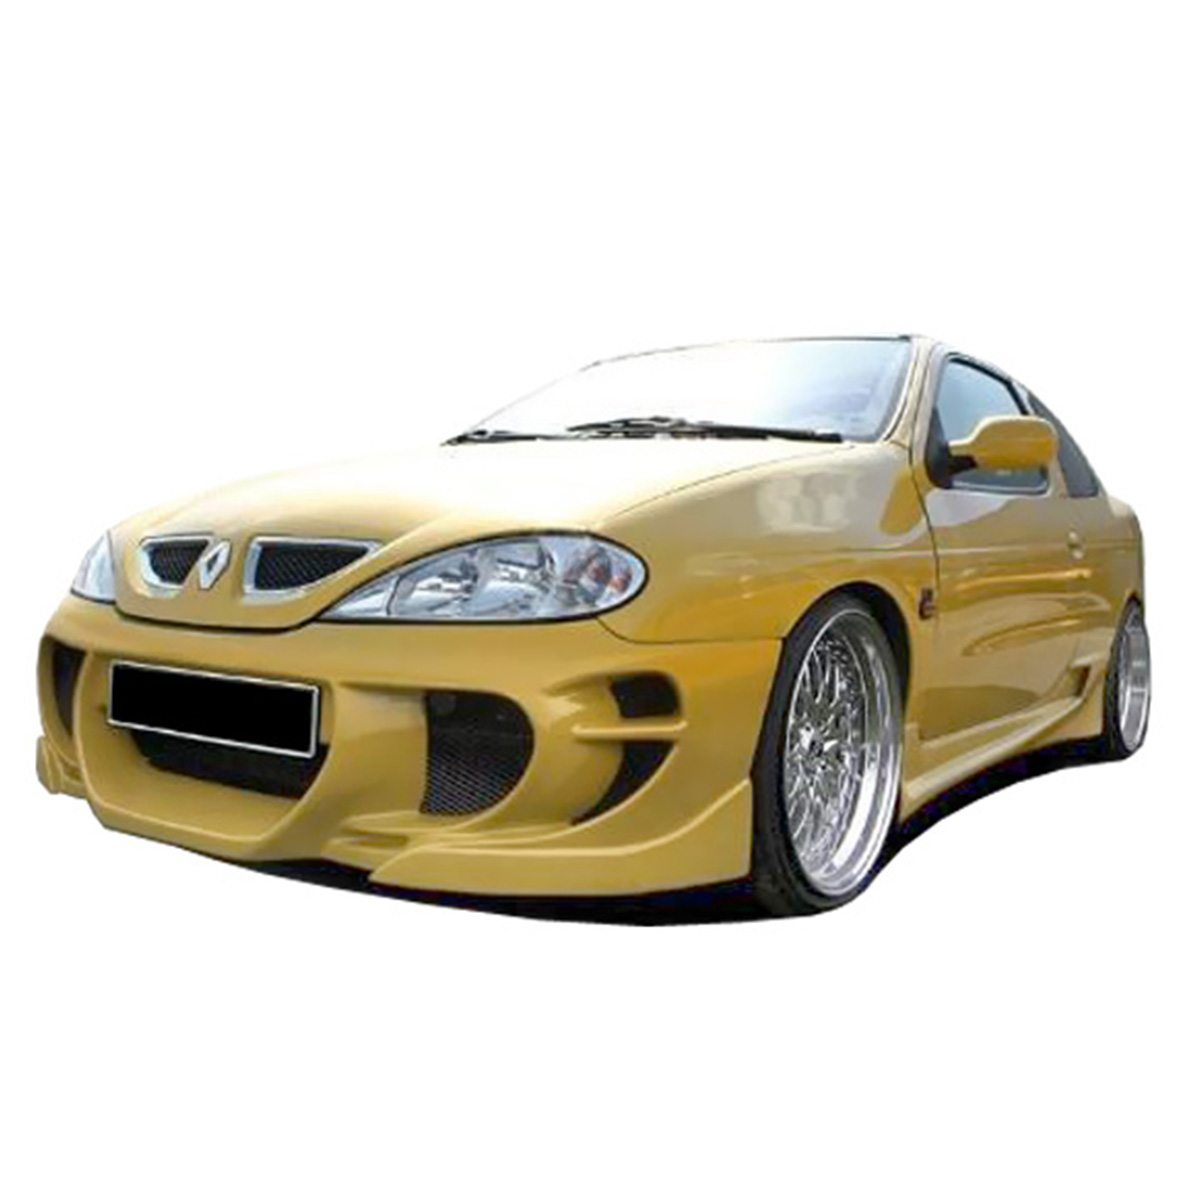 Renault-Megane-98-Frt-Extreme-PCN101